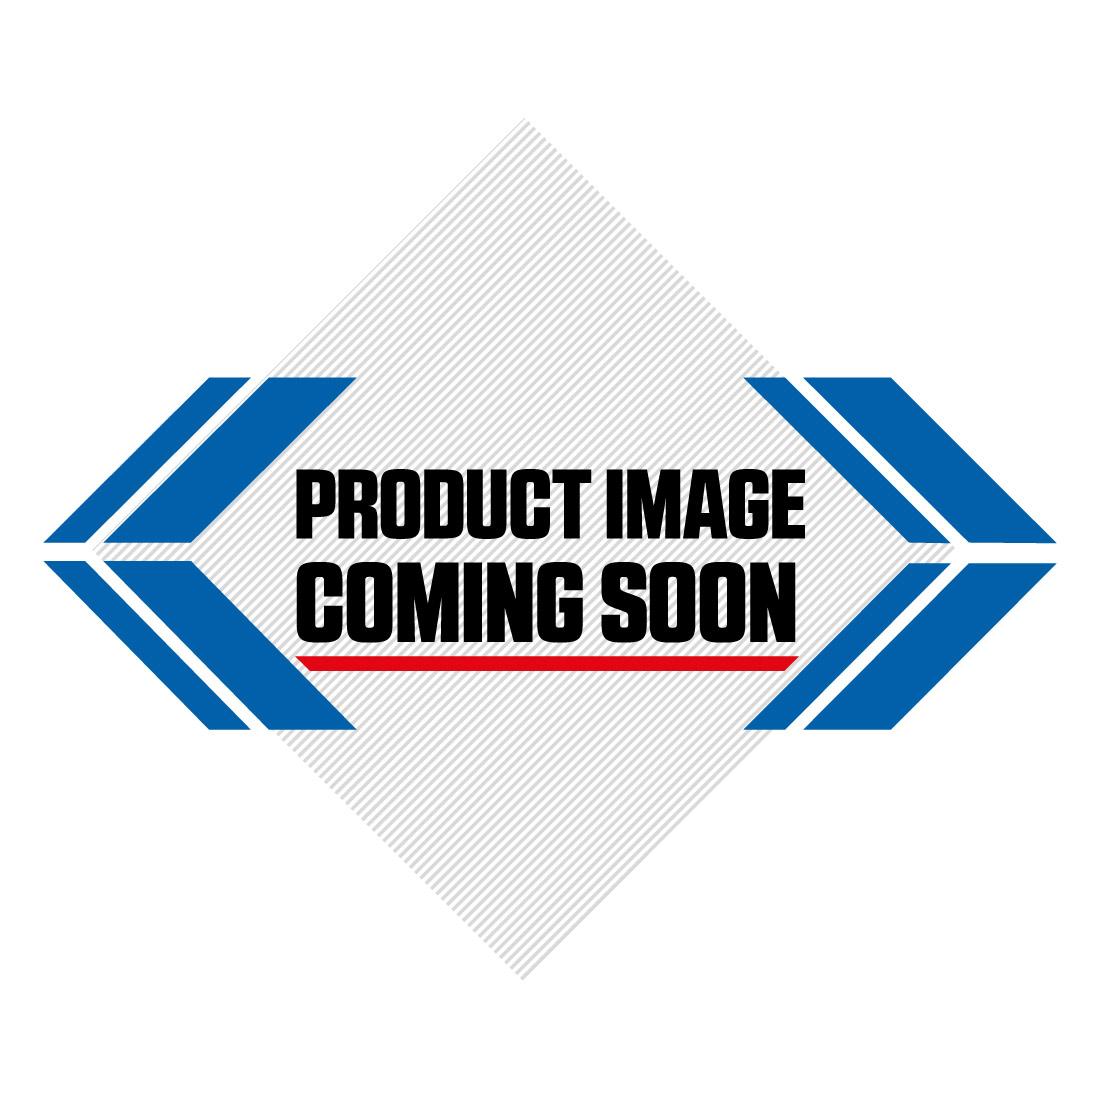 2019 UFO Interceptor 2 Helmet - Galaxy Limited Edition Image-1>